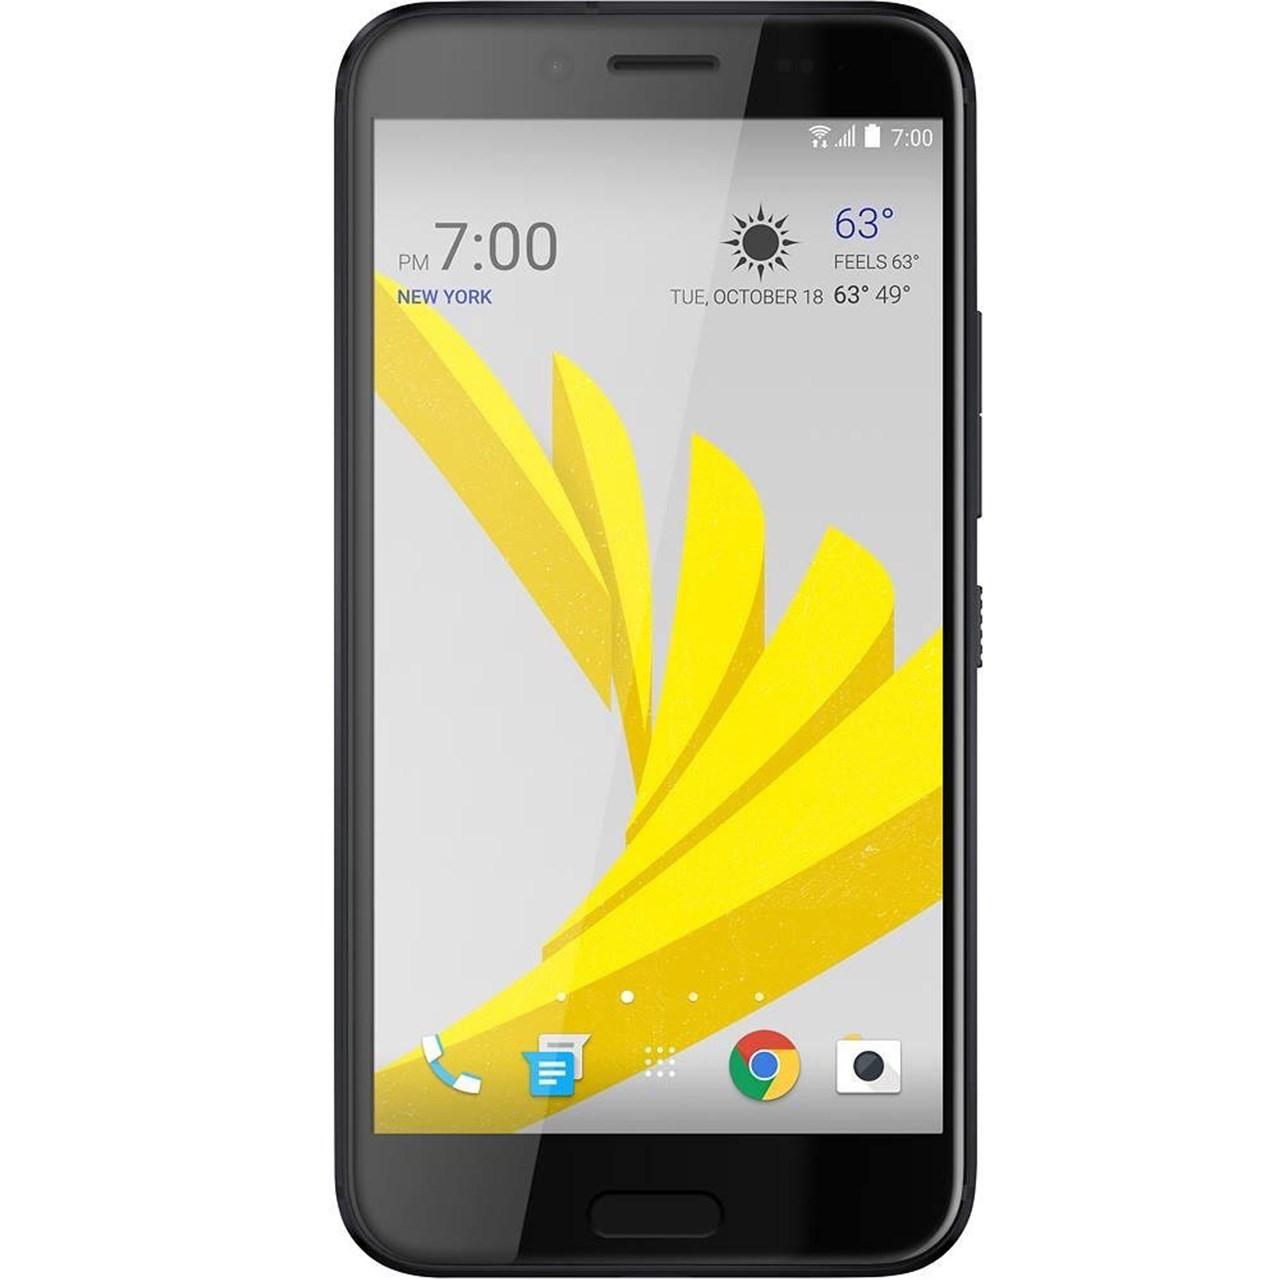 گوشی موبایل اچ تی سی مدل 10 Evo | HTC 10 Evo Mobile Phone